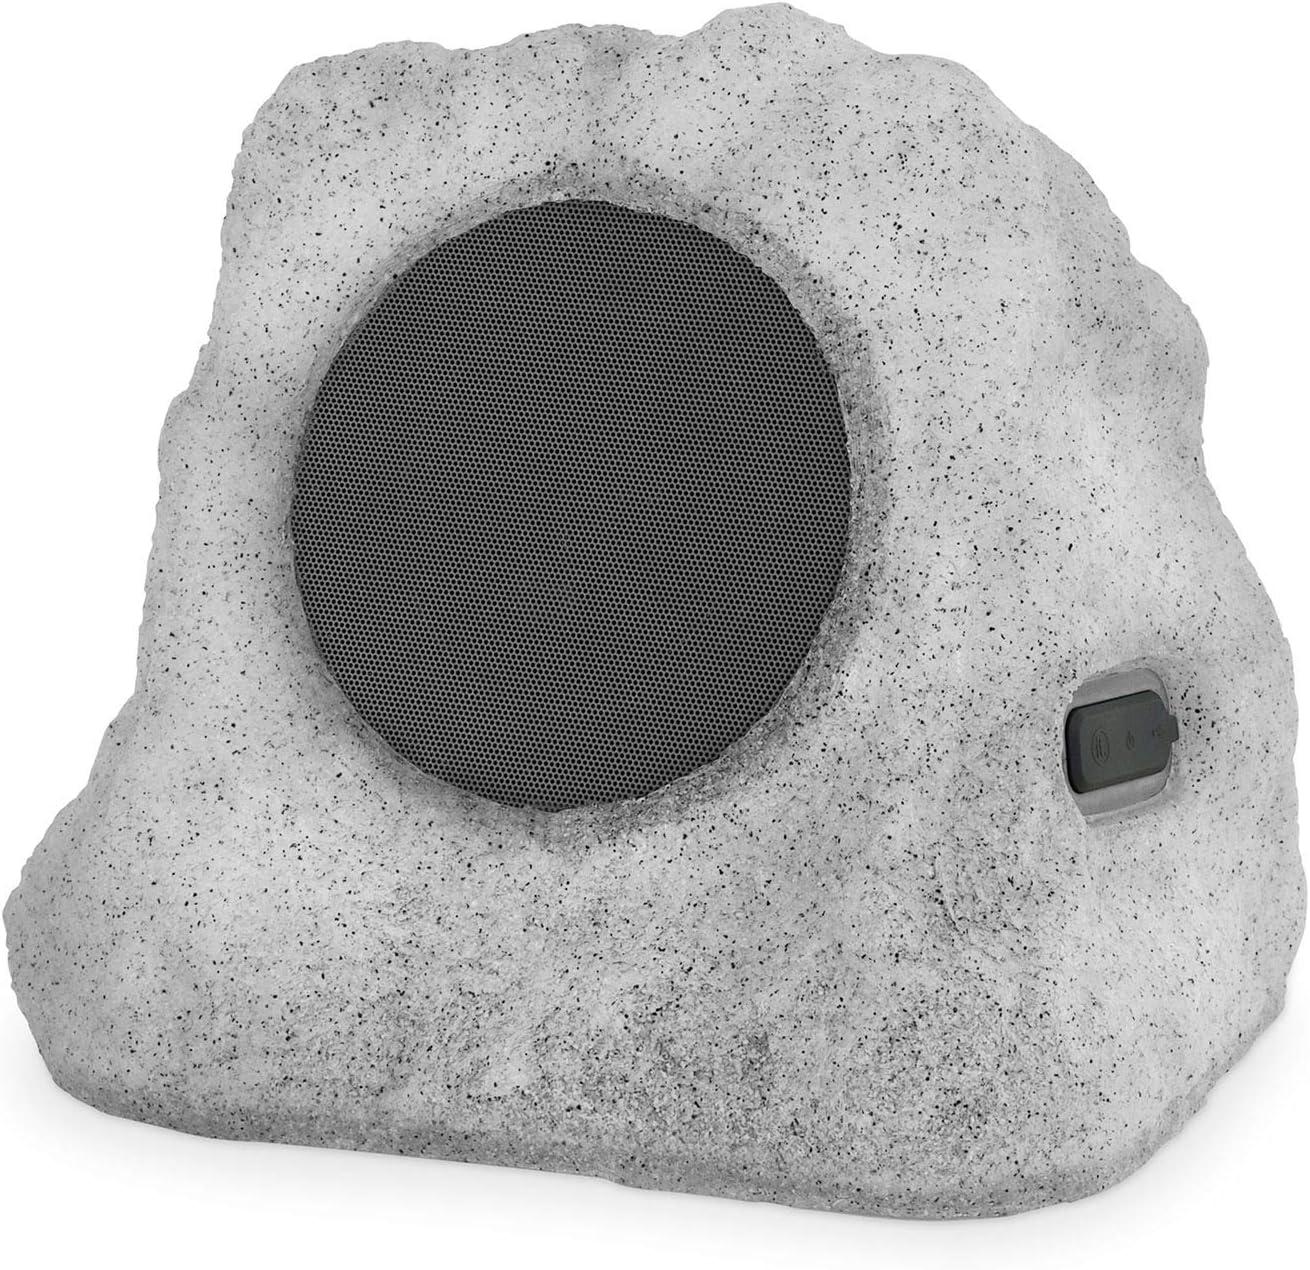 Victrola Outdoor LED Lightup Rock Speaker Single - Wireless Bluetooth Speaker for Garden, Patio | Waterproof Design, Built for All Seasons | Rechargeable Battery | Wireless Music Streaming